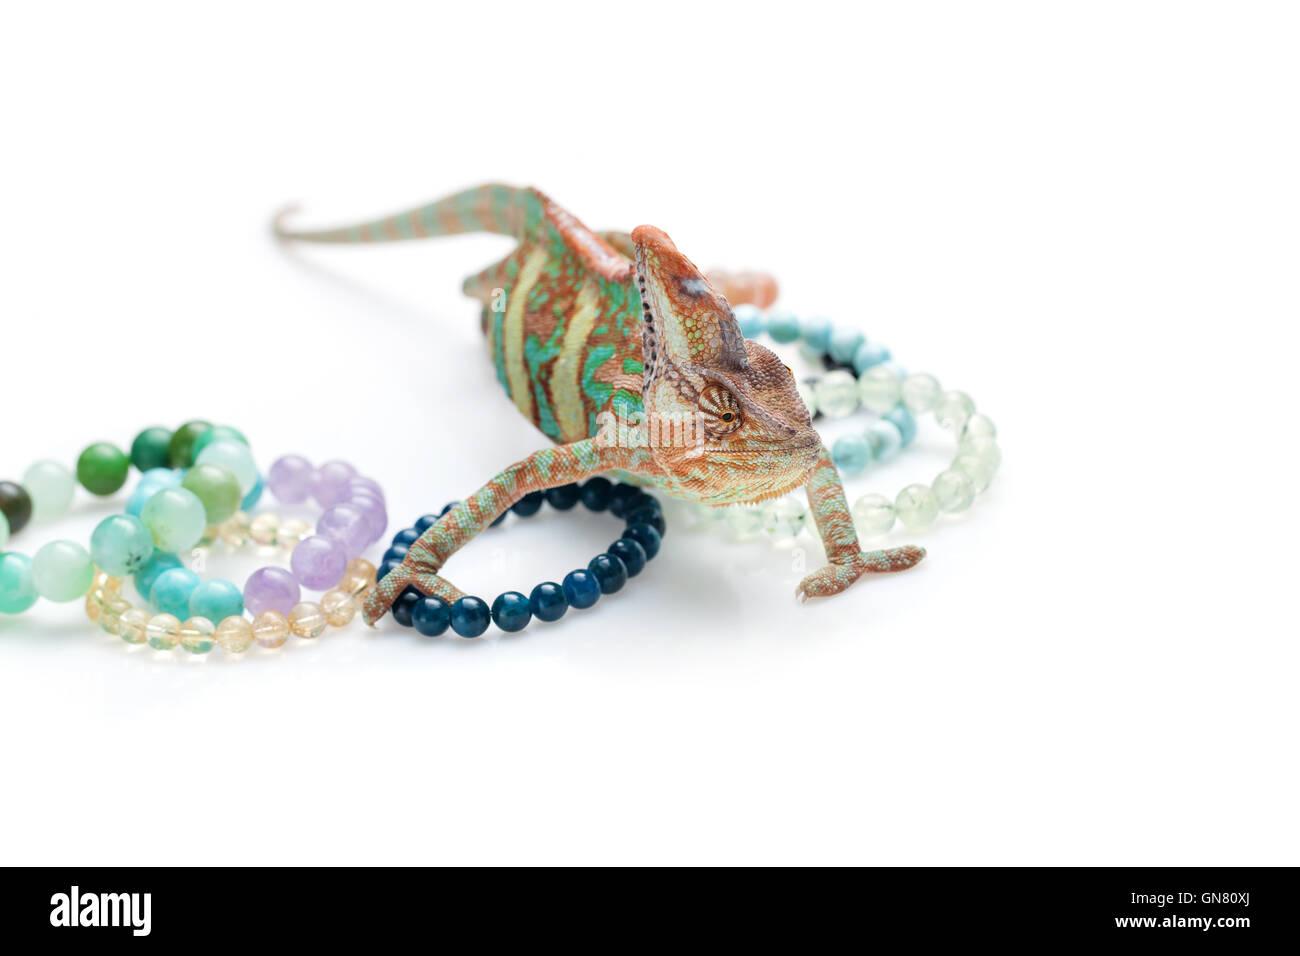 Beautiful chameleon with natural stone bracelets - Stock Image